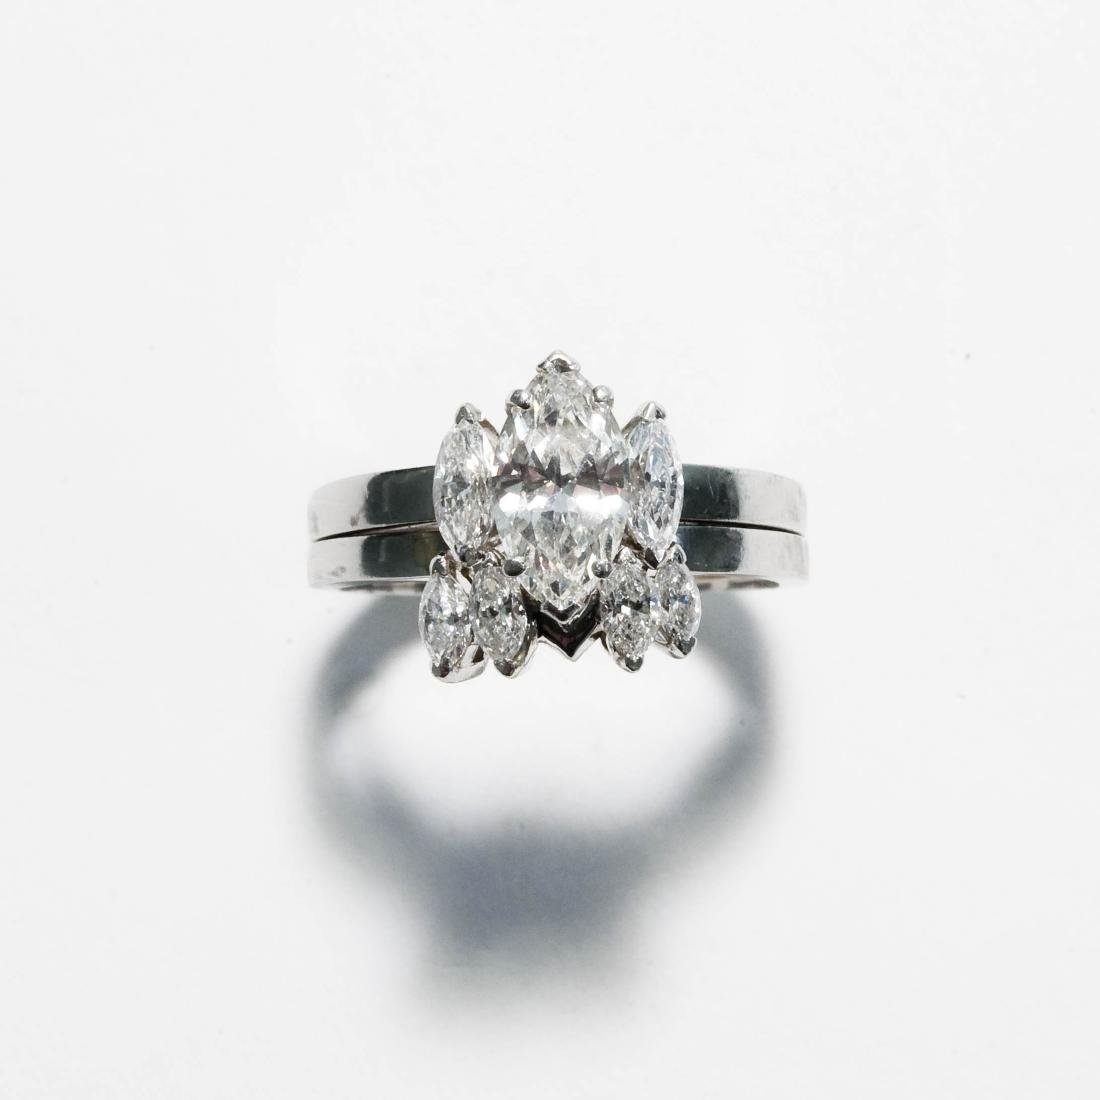 Ladies' Platinum & Diamond Wedding Ring Set.